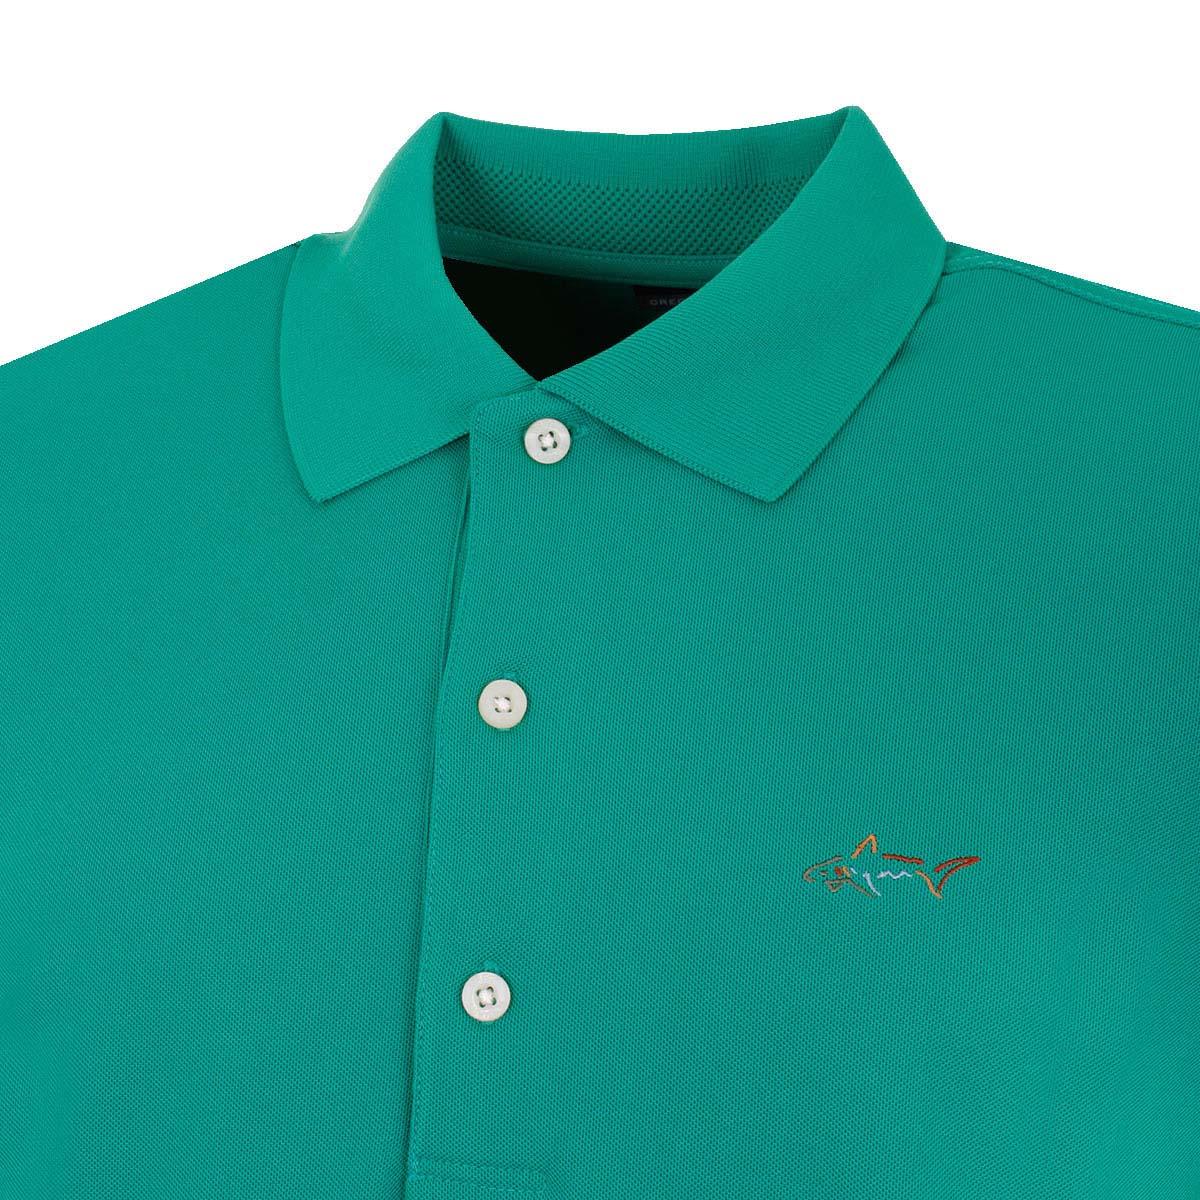 Greg-Norman-Mens-KX04-Performance-Micro-Pique-Golf-Polo-Shirt-28-OFF-RRP thumbnail 30